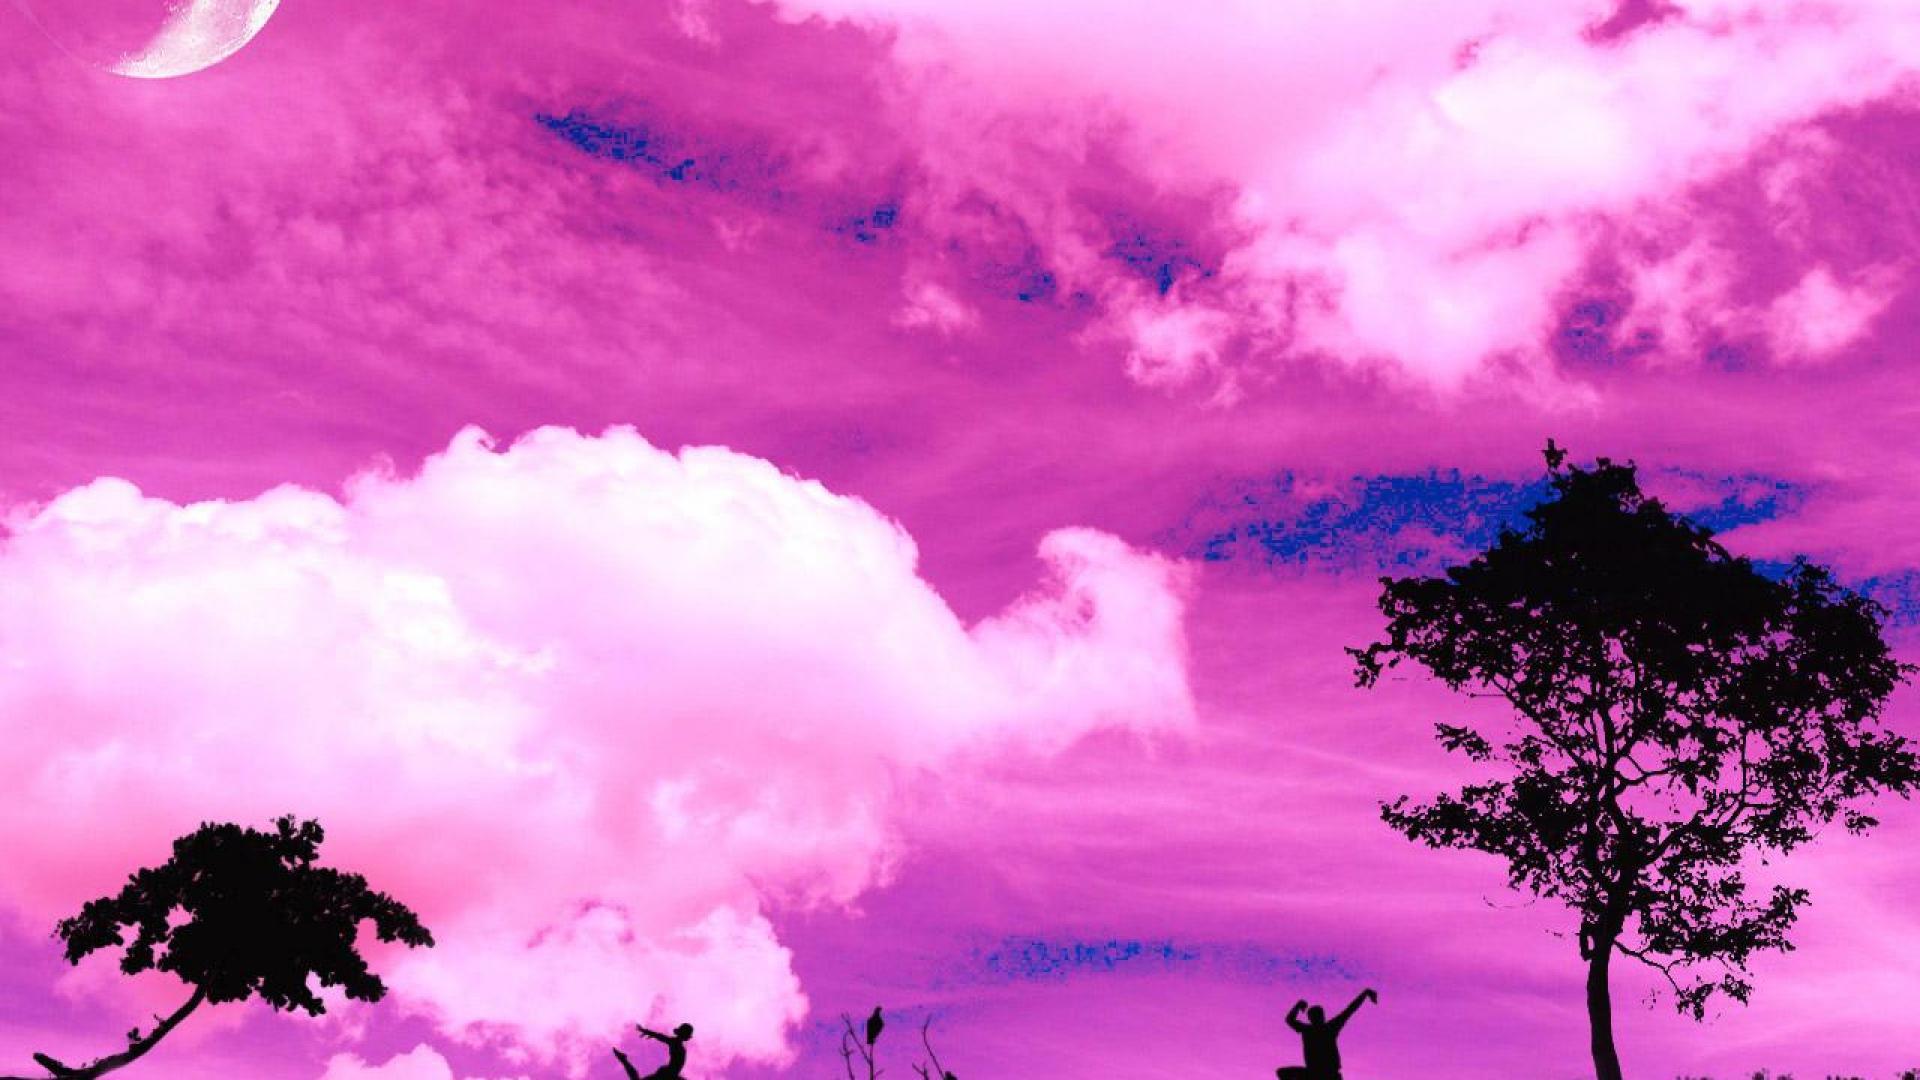 Pink Desktop Wallpaper Related Keywords amp Suggestions 1920x1080